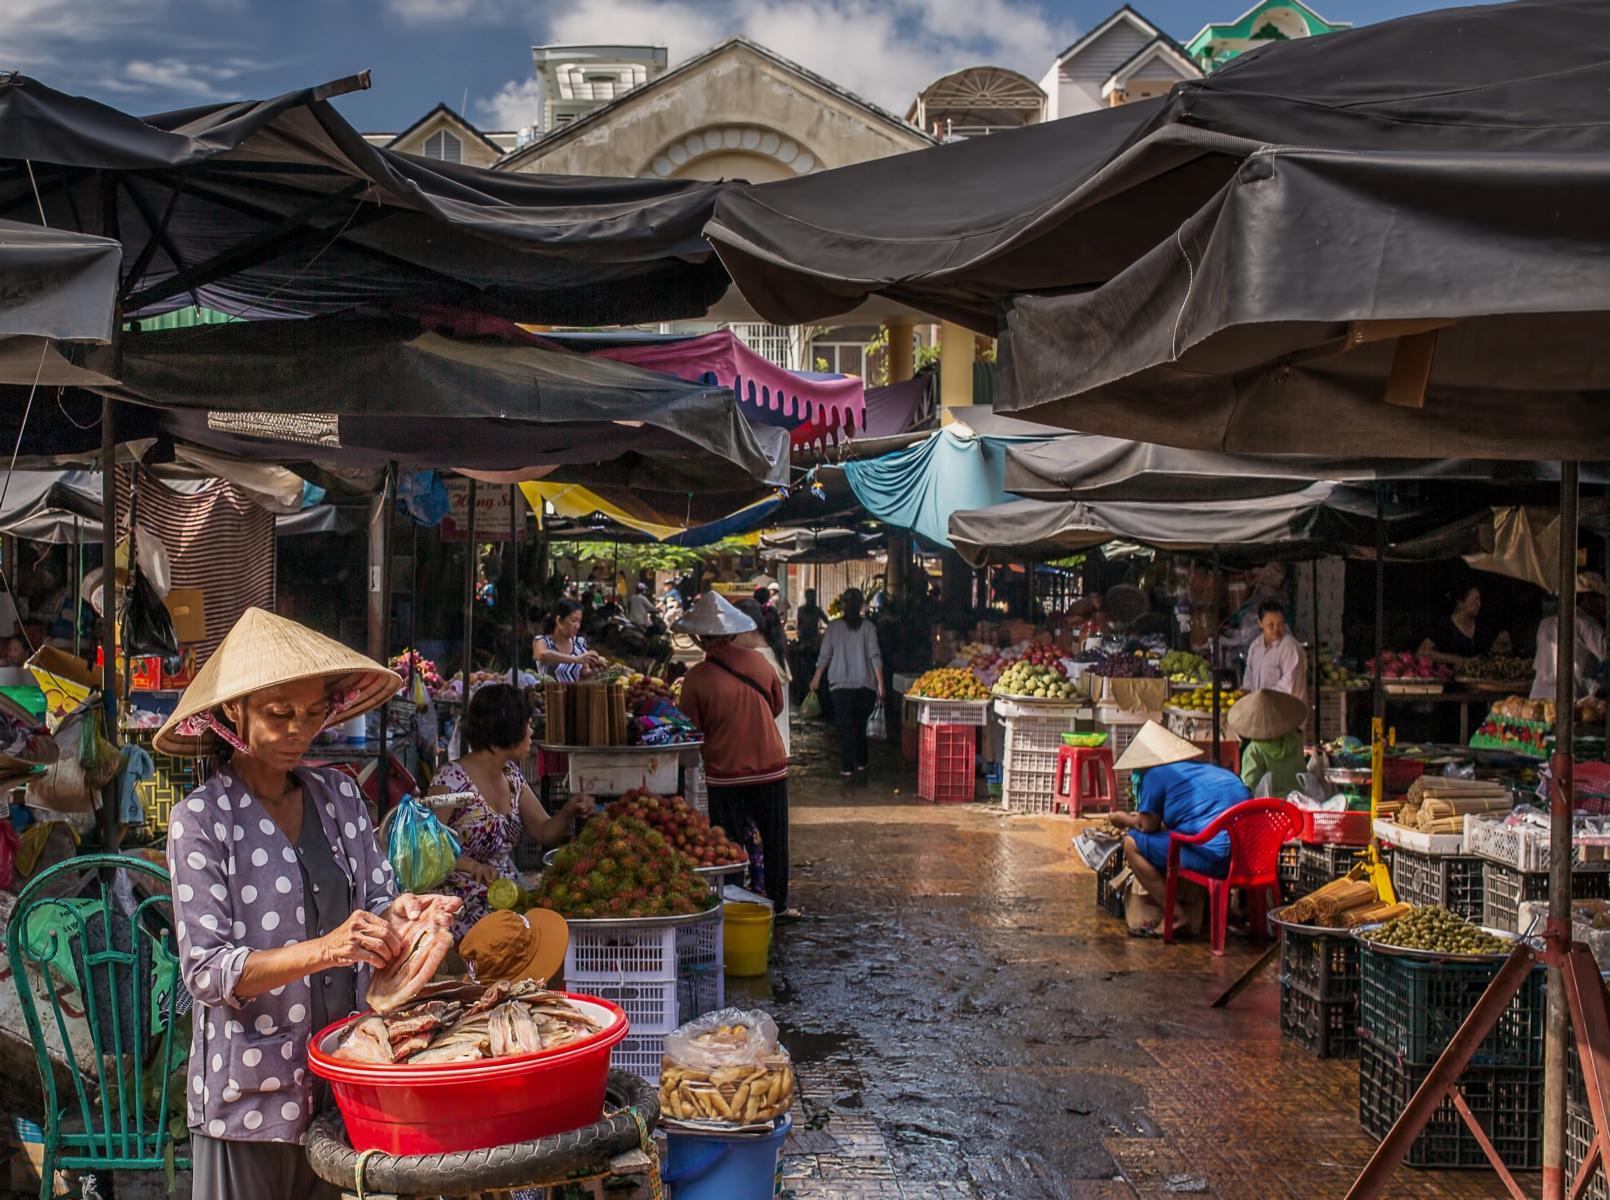 Lokaler Markt im Mekongdelta bei einem Landausflug